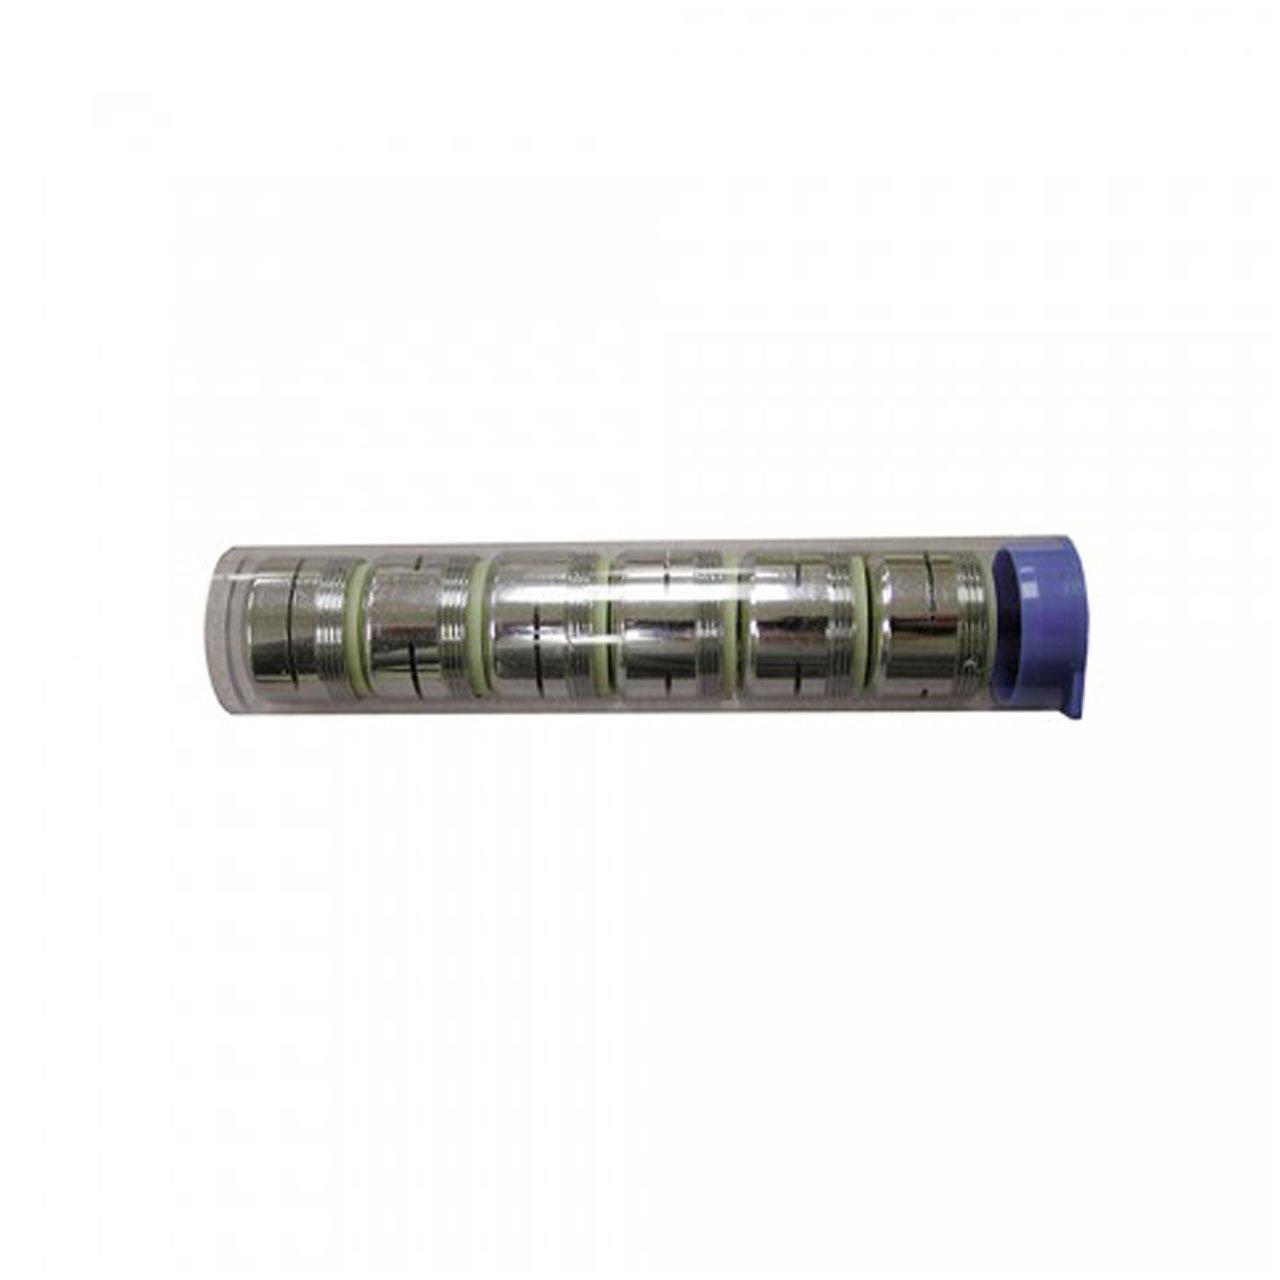 Jones Stephens A01020 Dual Thread Slotted Full Flow Aerator, Small